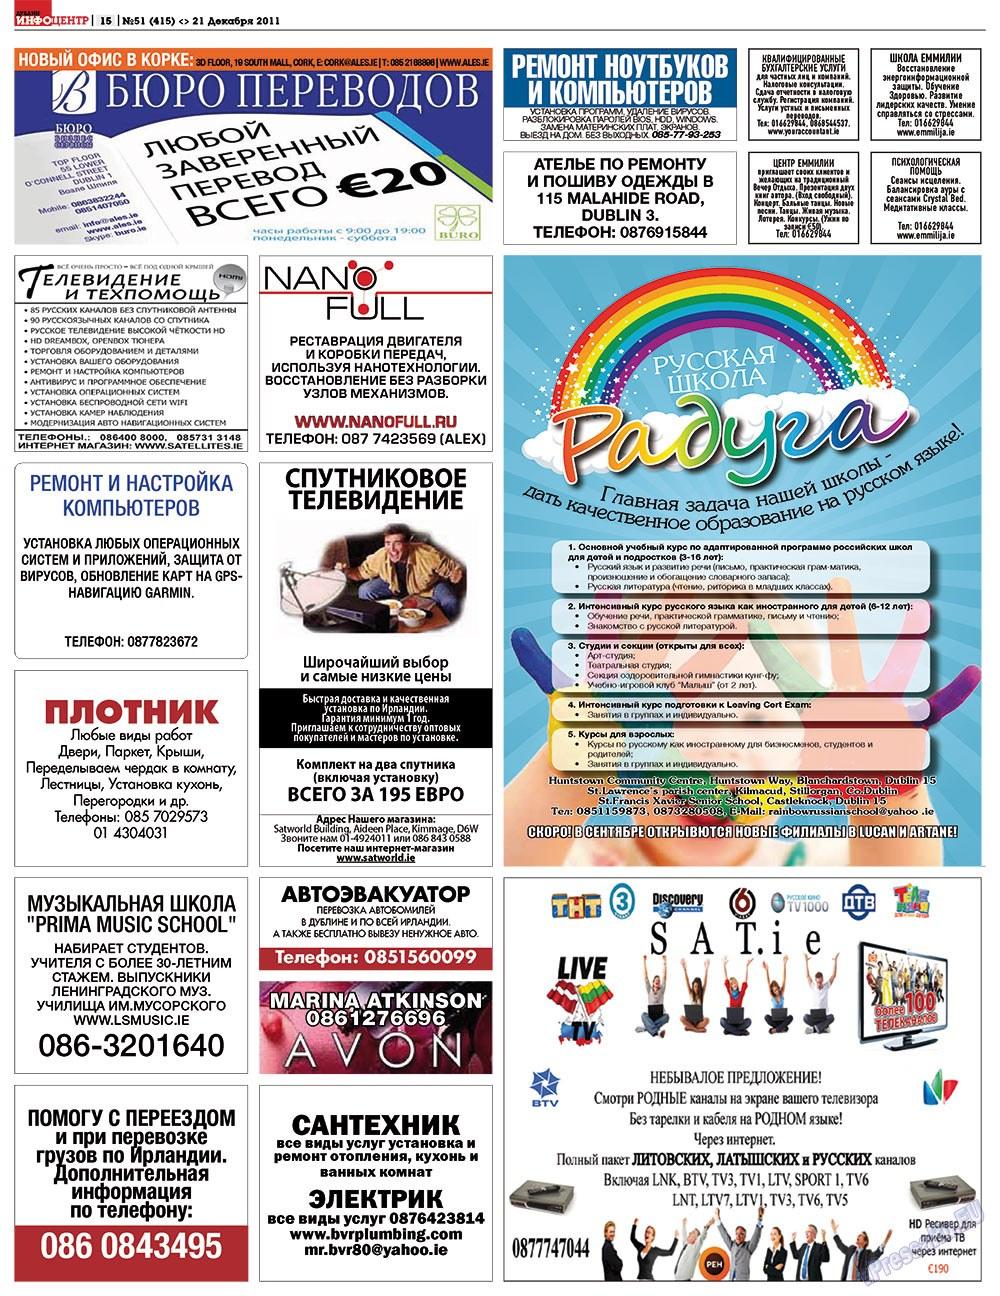 Дублин инфоцентр (газета). 2011 год, номер 51, стр. 15